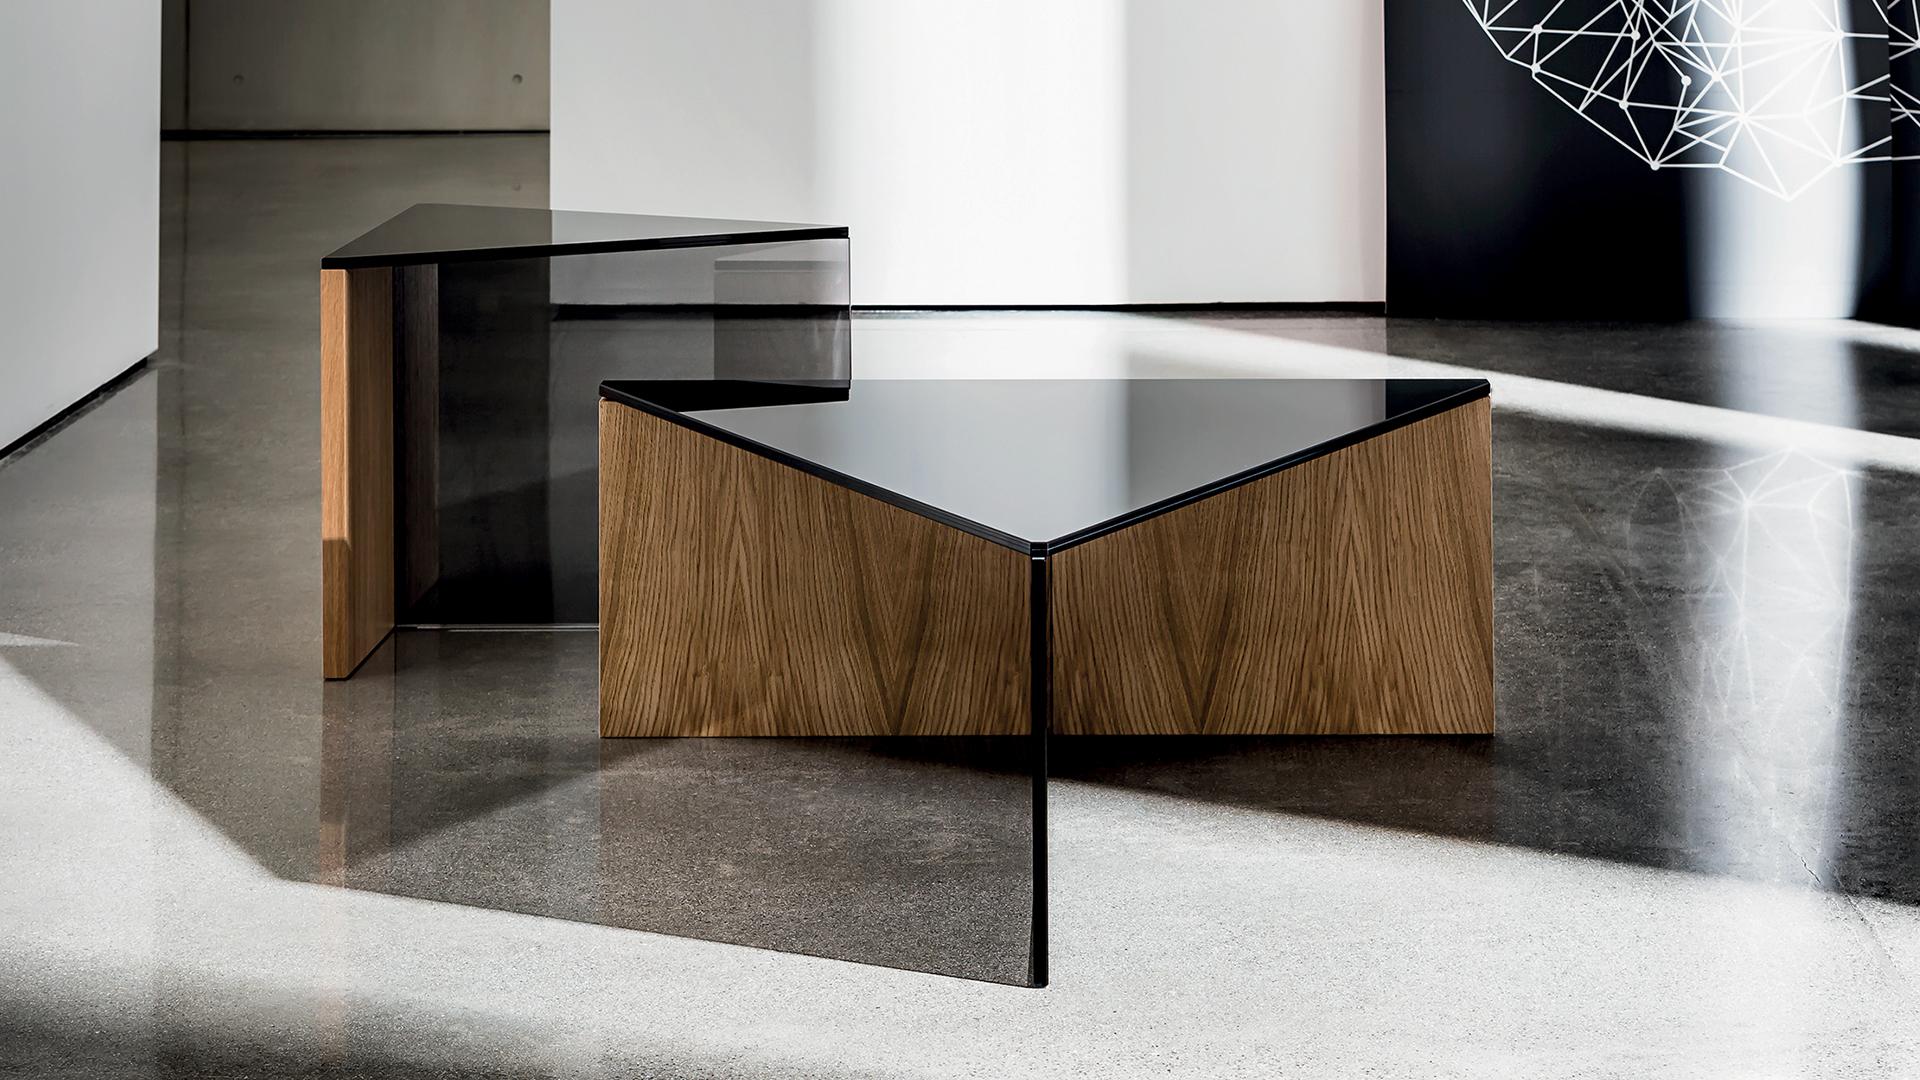 - REGOLO Triangular Natural Wood Coffee Table - SOVET